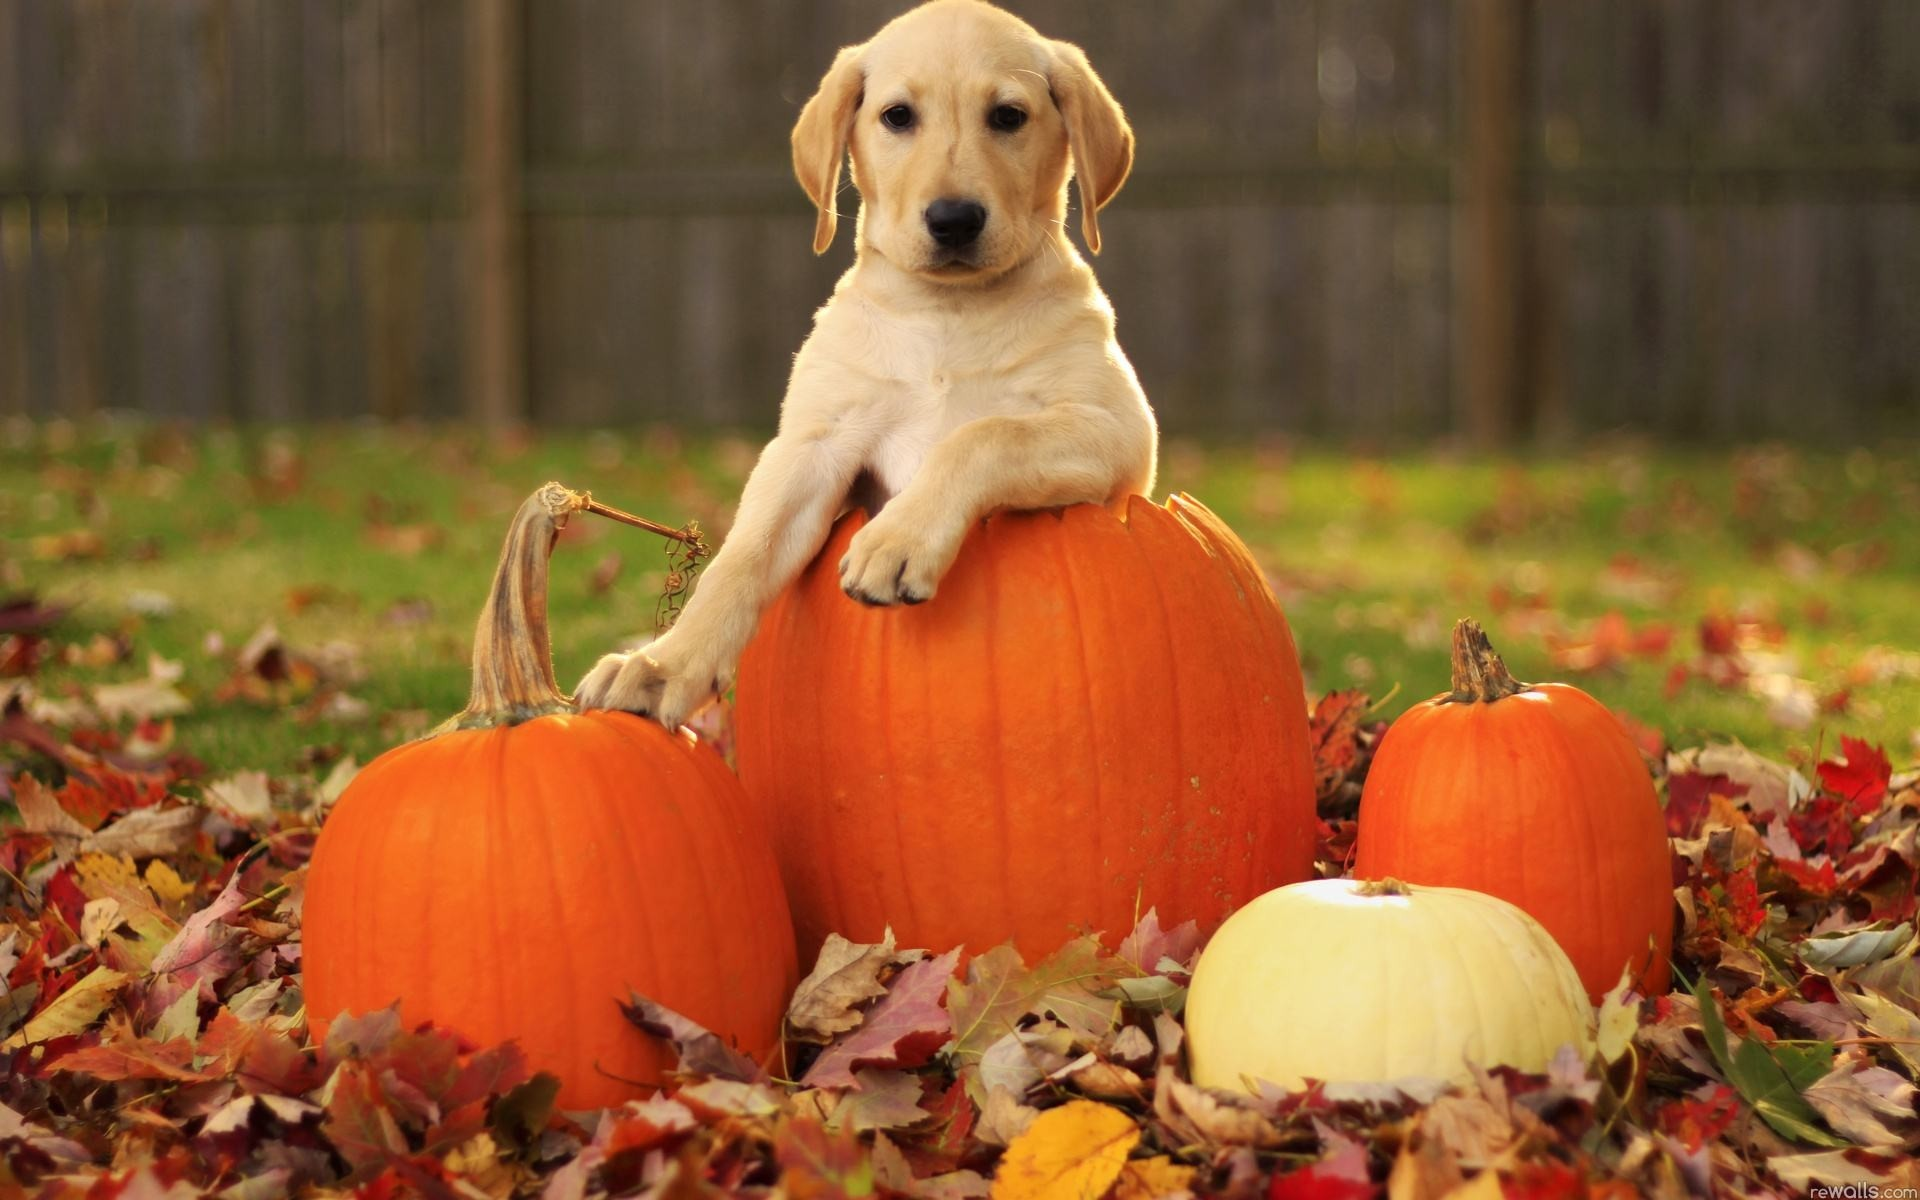 Wallpapers Backgrounds – Wallpaper puppy pumpkin leaves desktop